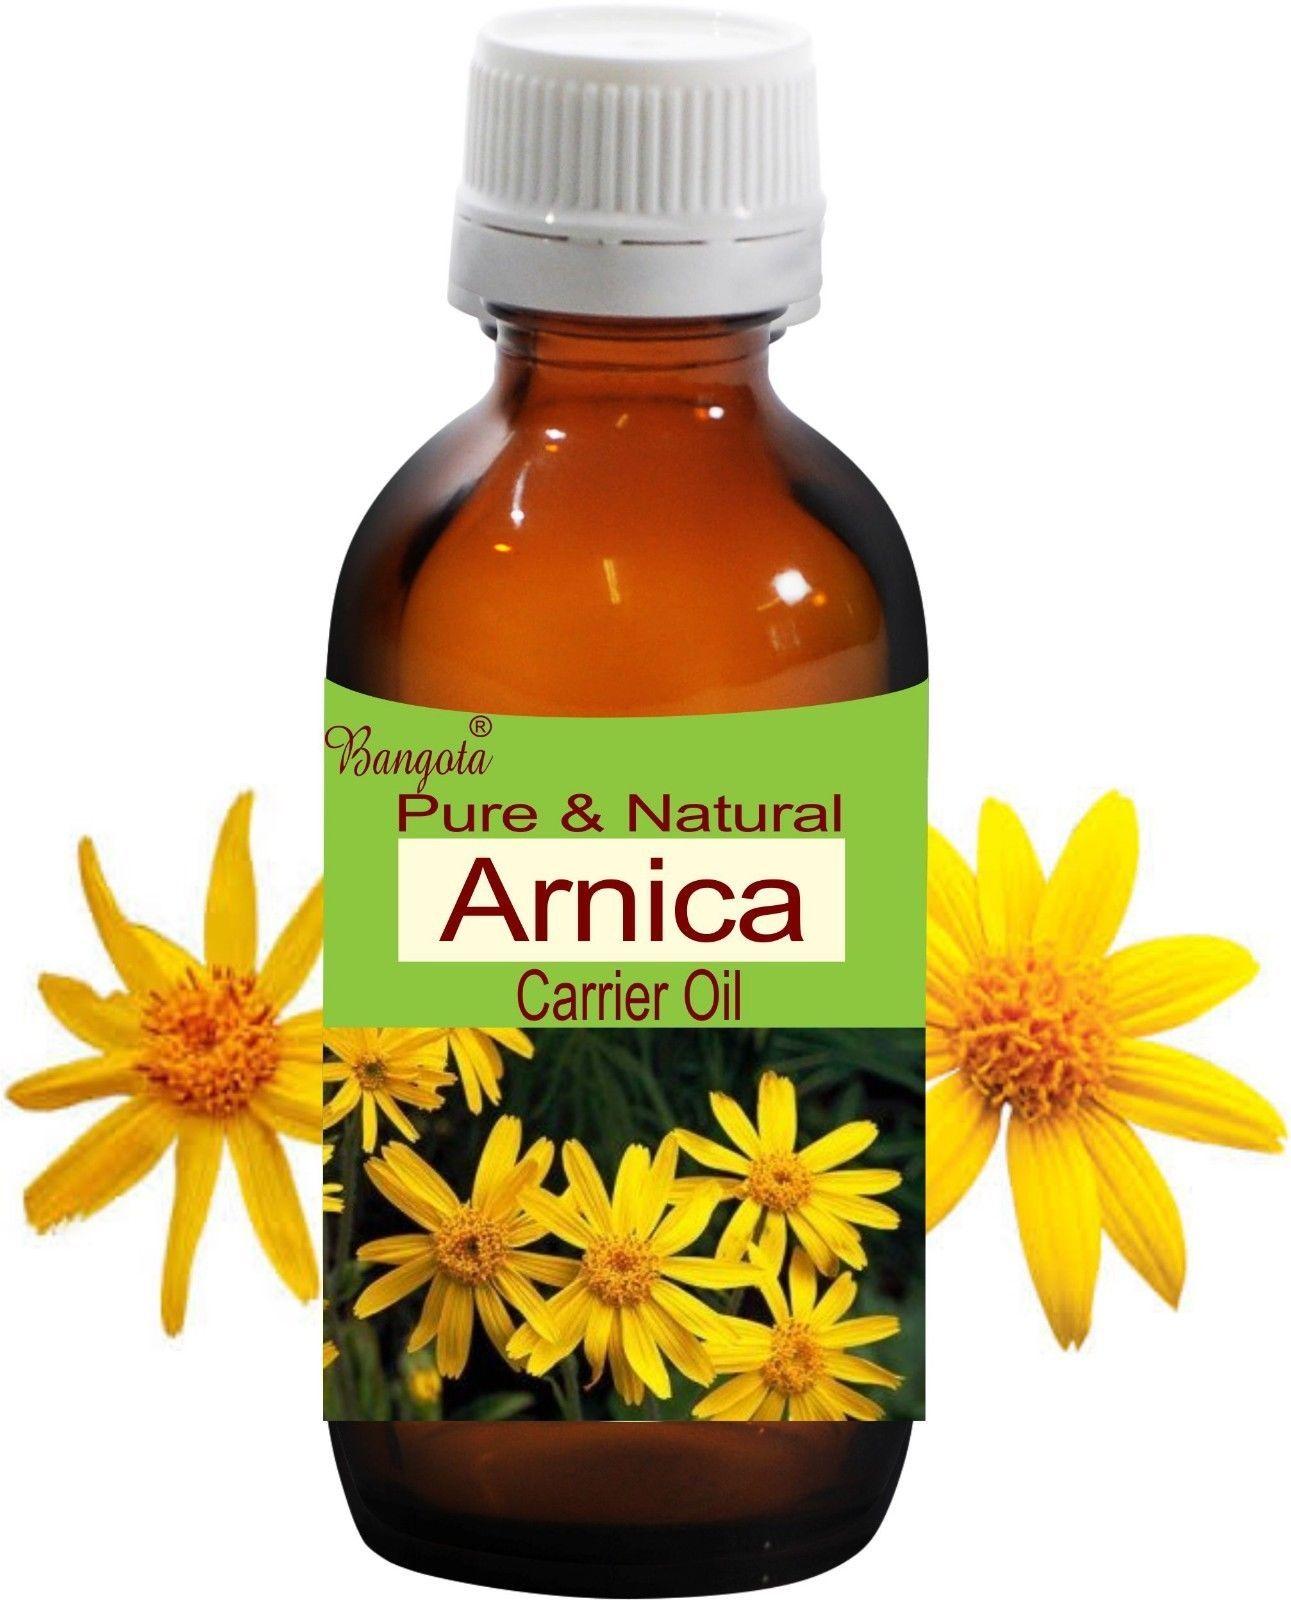 Arnica Oil- Pure & Natural Carrier Oil- 50ml Arnica Montana by Bangota